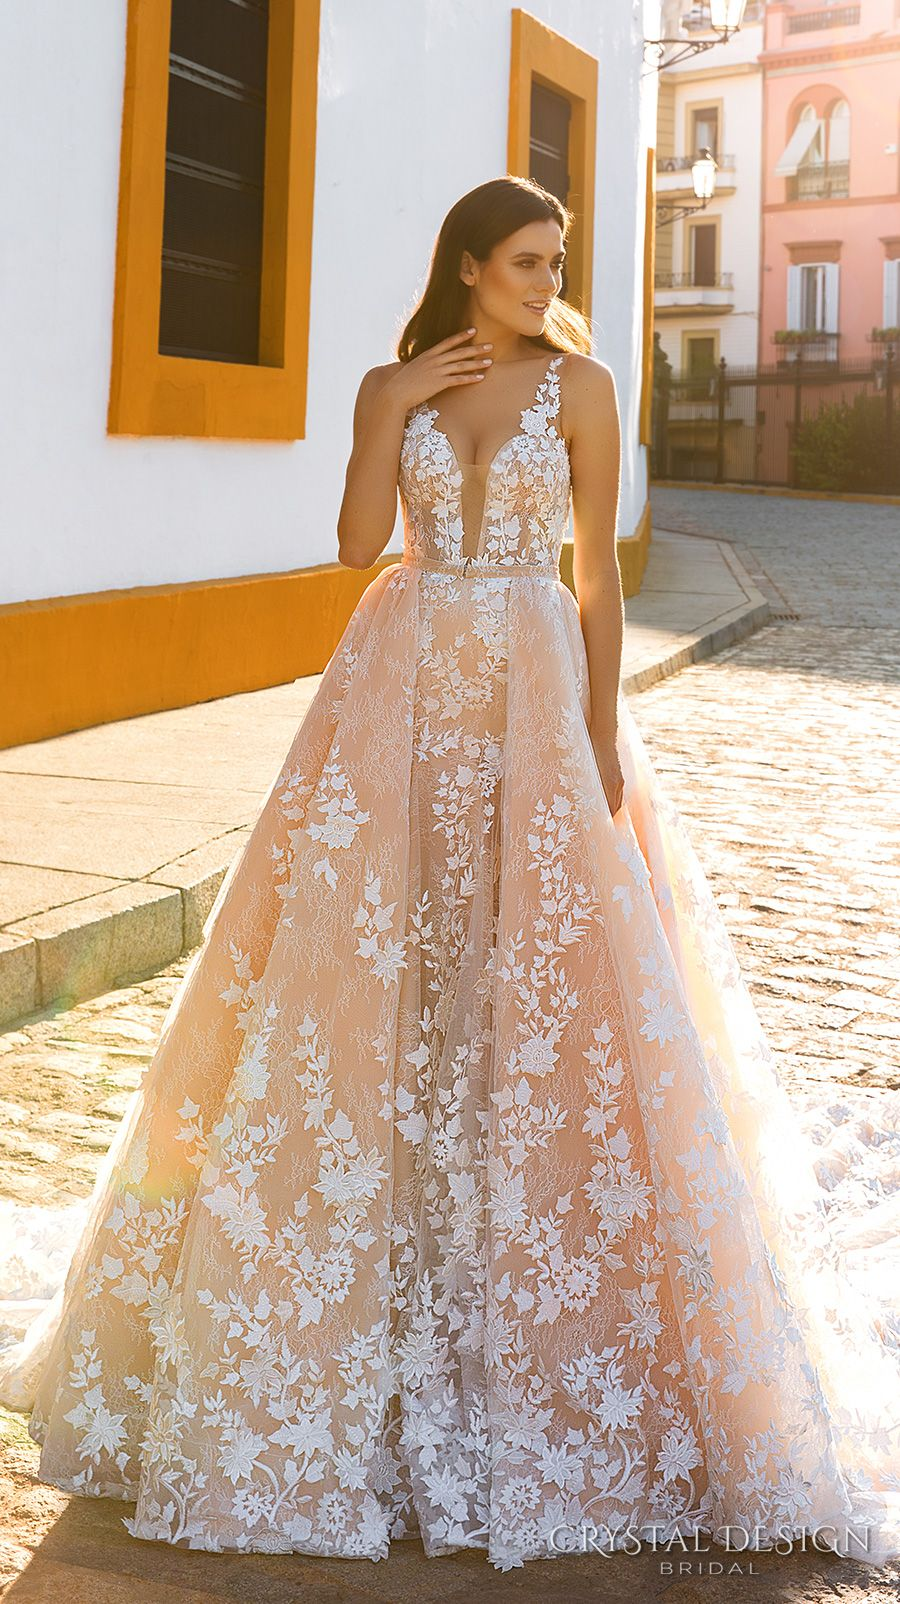 feb8cec017a5f Crystal Design 2017 bridal sleeveless strap deep plunging sweetheart  neckline full embellishment blush color romantic a line wedding dress sheer  back royal ...